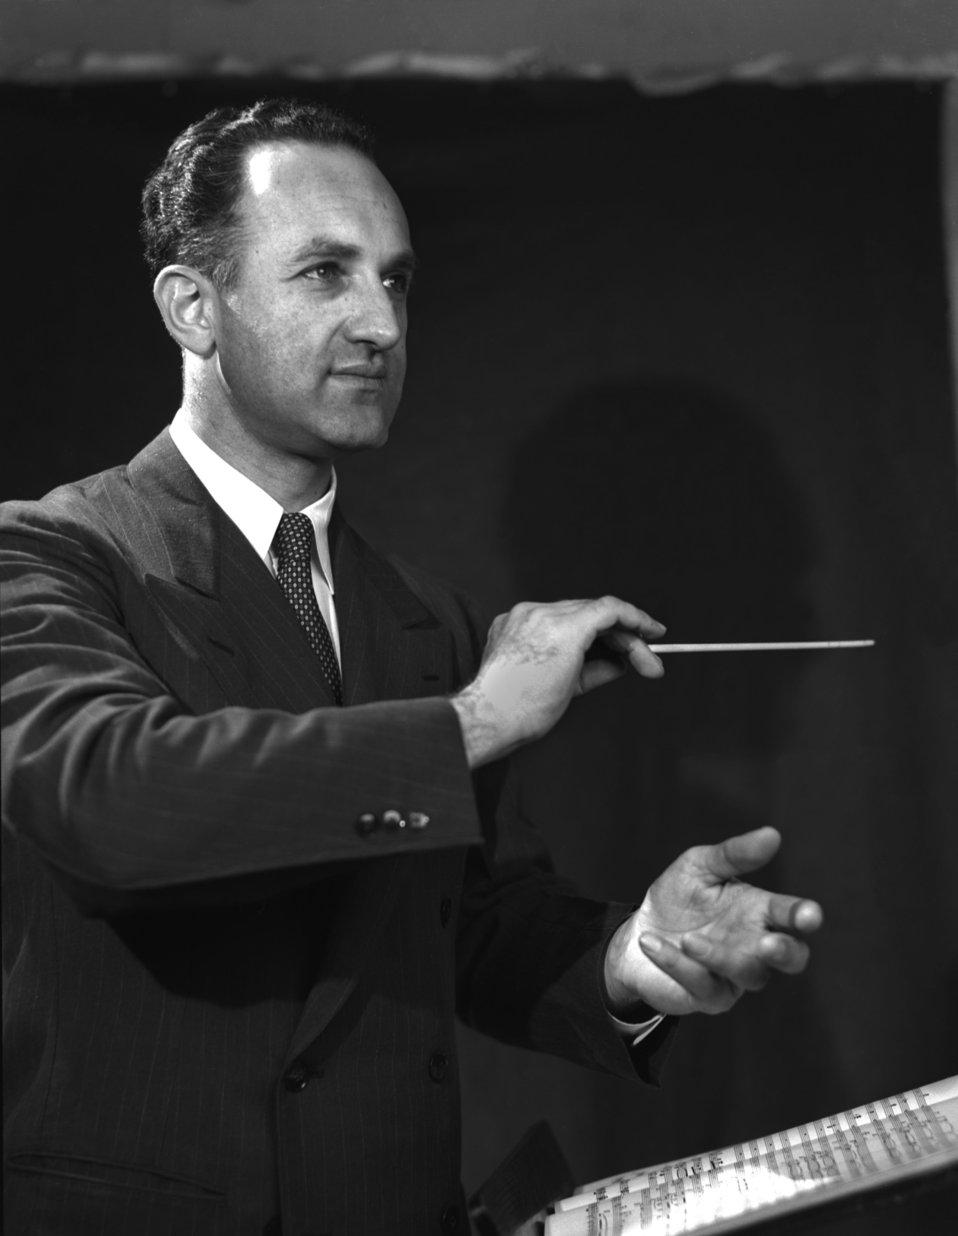 Dr. Waldo Cohn Biochemist/Conductor Oak Ridge